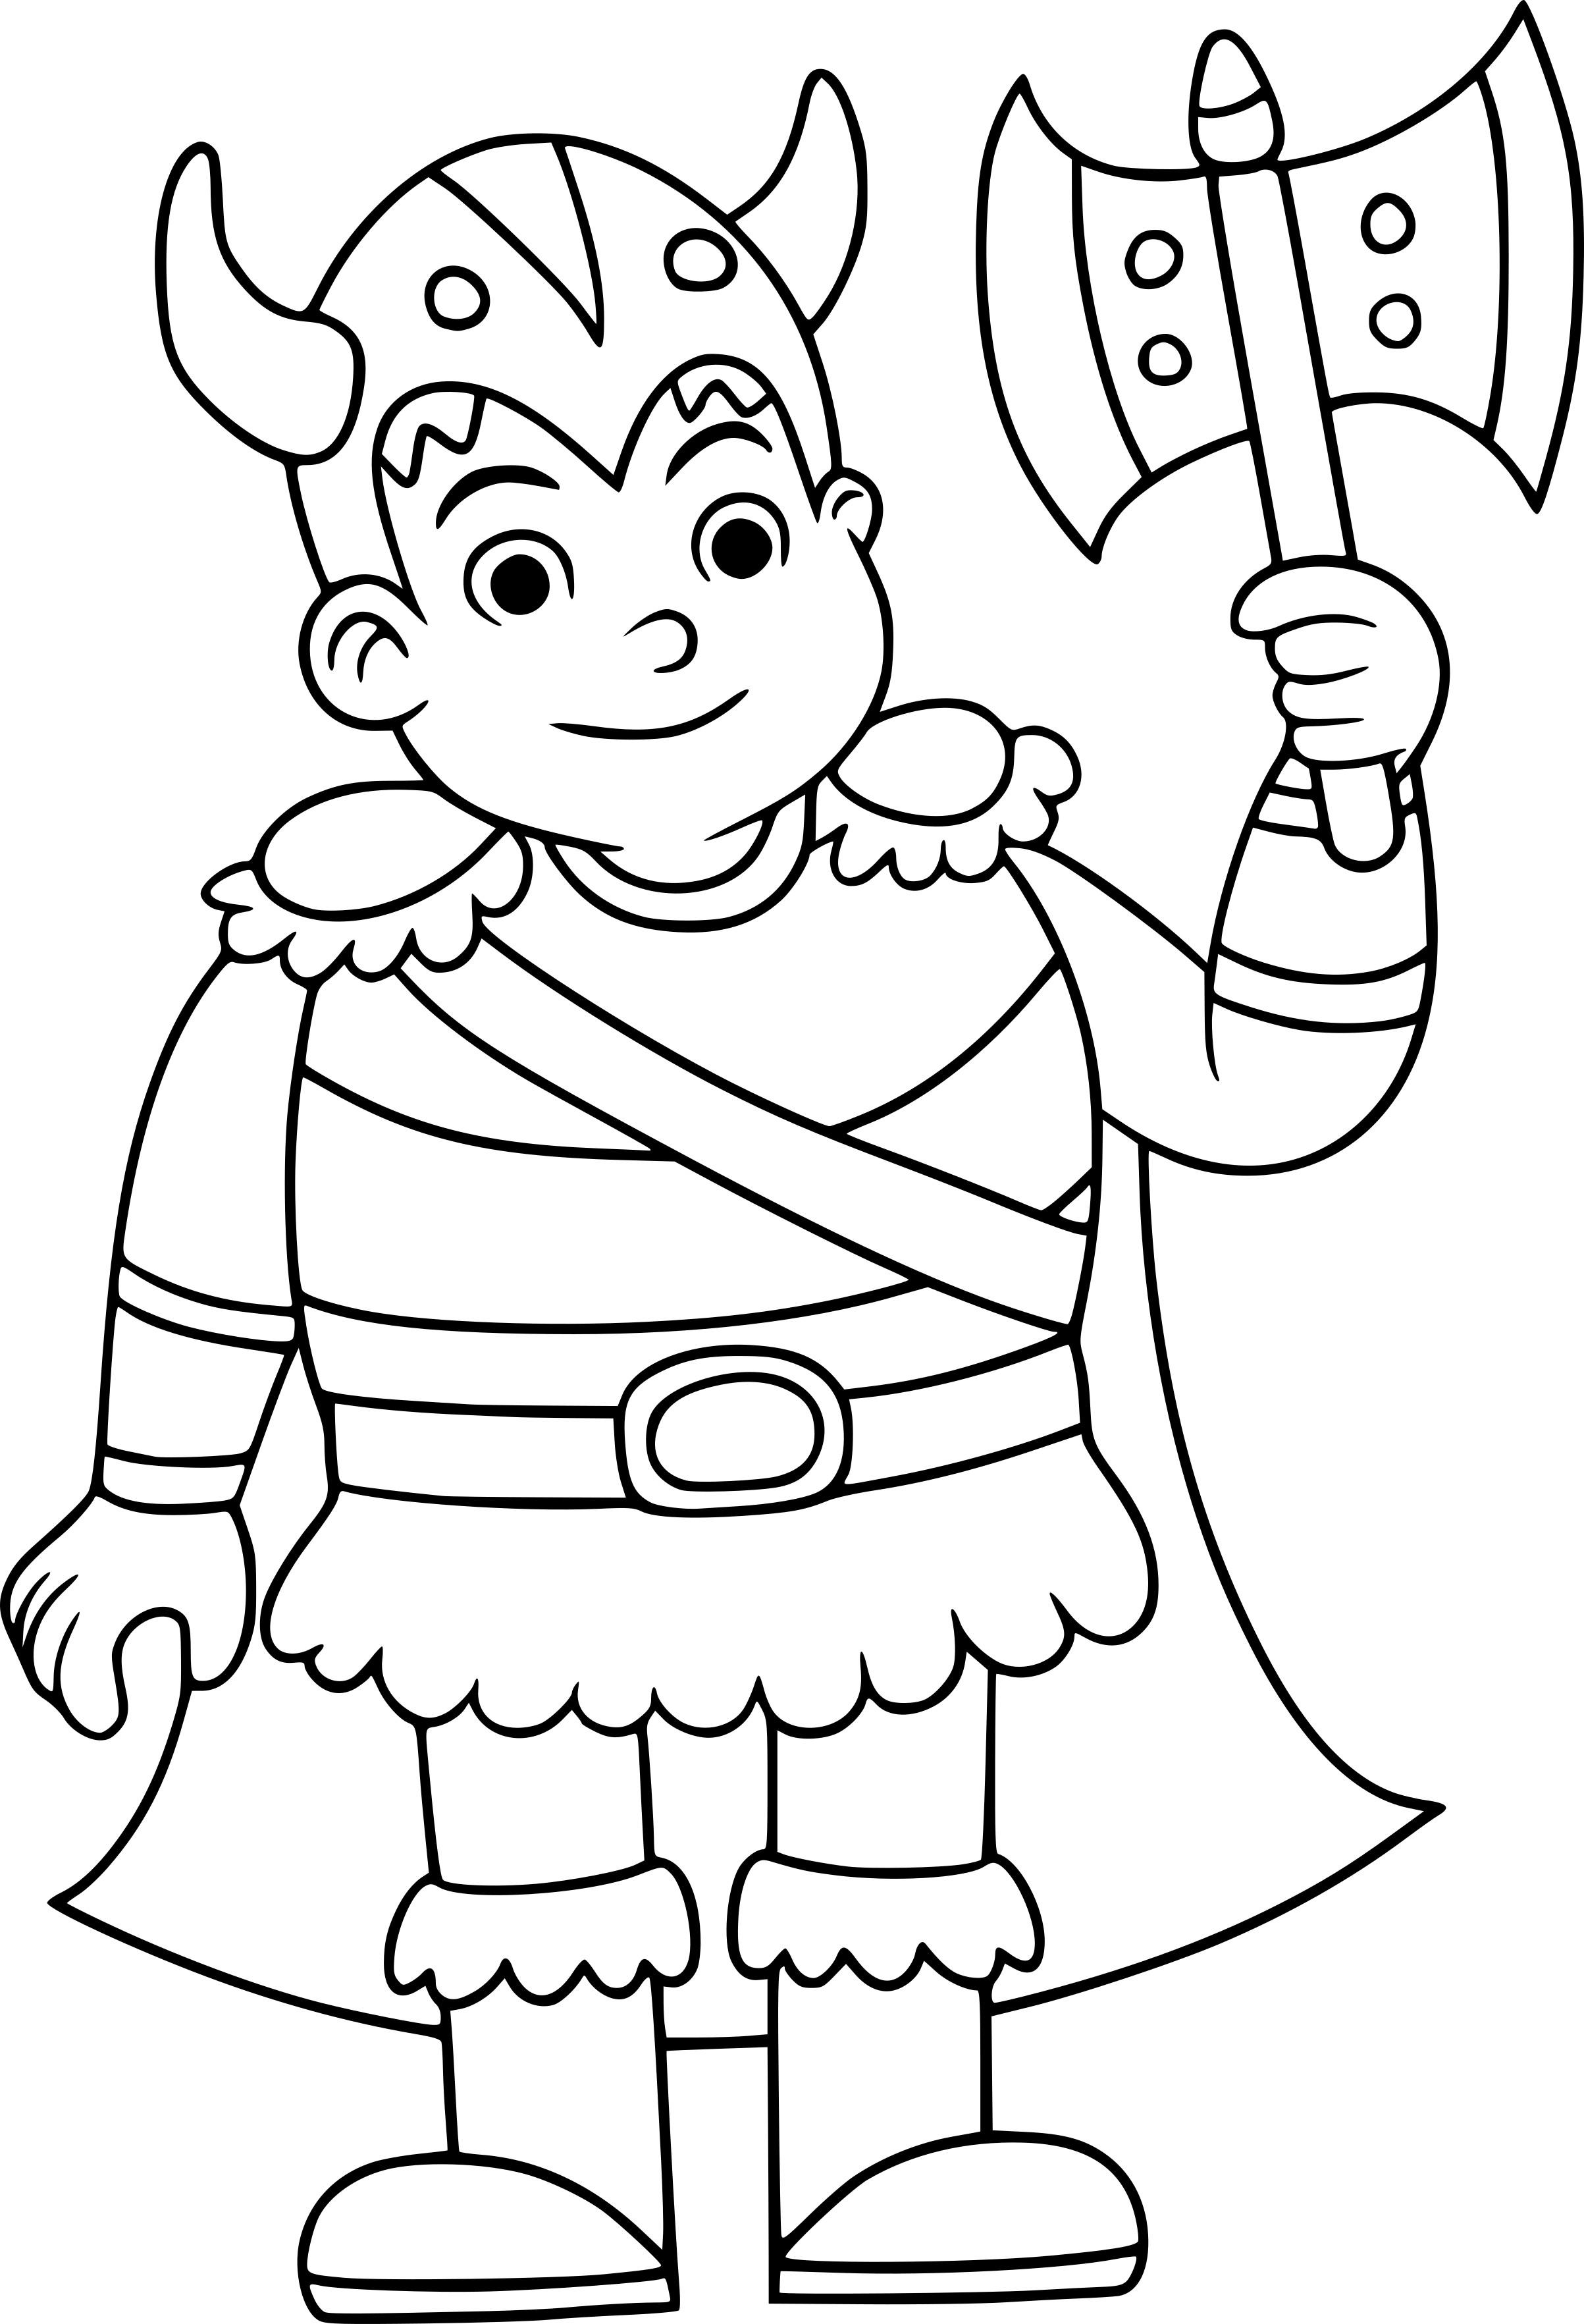 Coloriage viking avec sa hache imprimer - Dessin de viking ...